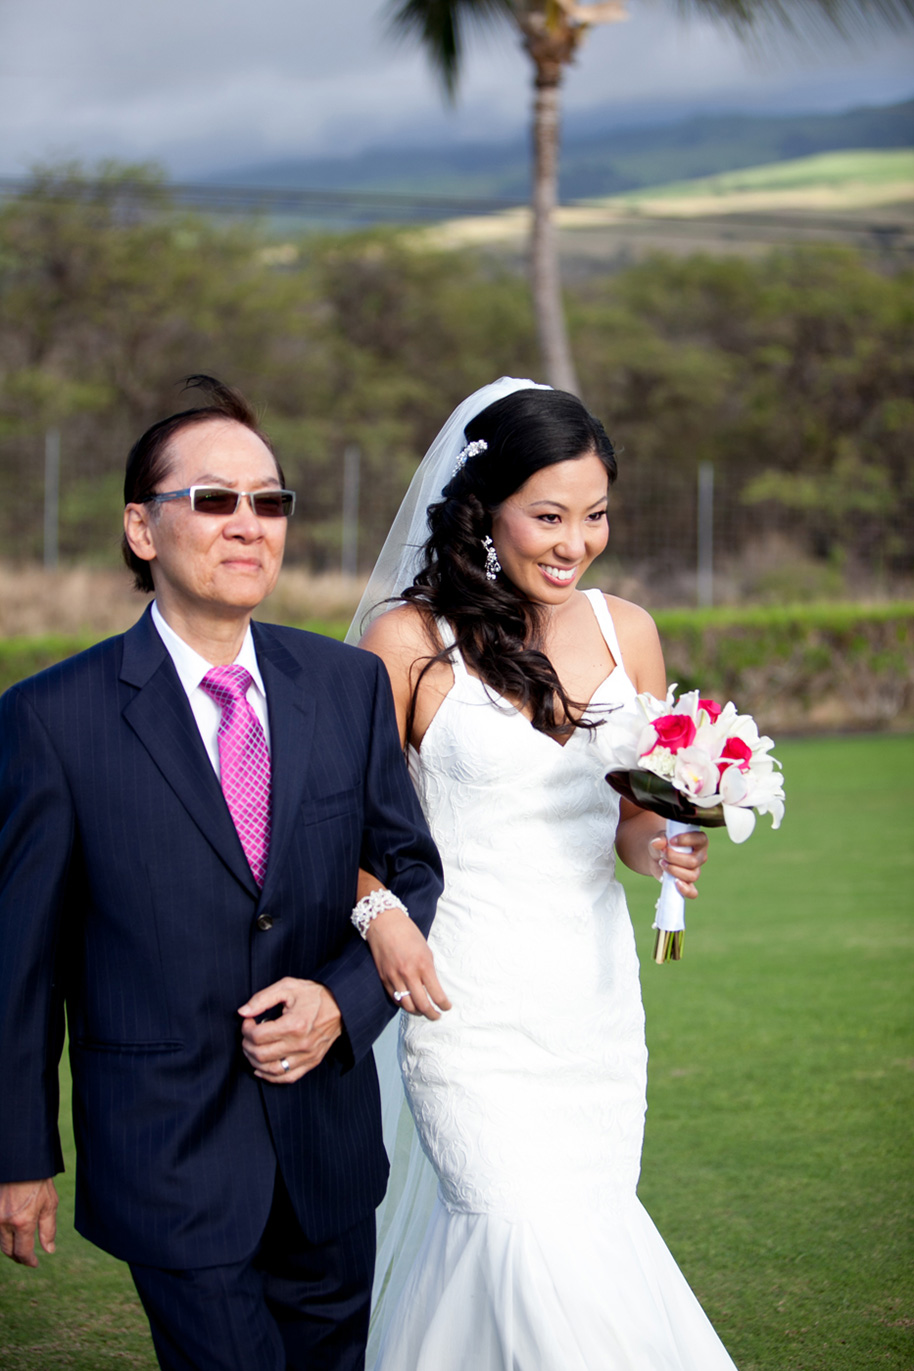 Maui-Beach-Wedding-041216-9